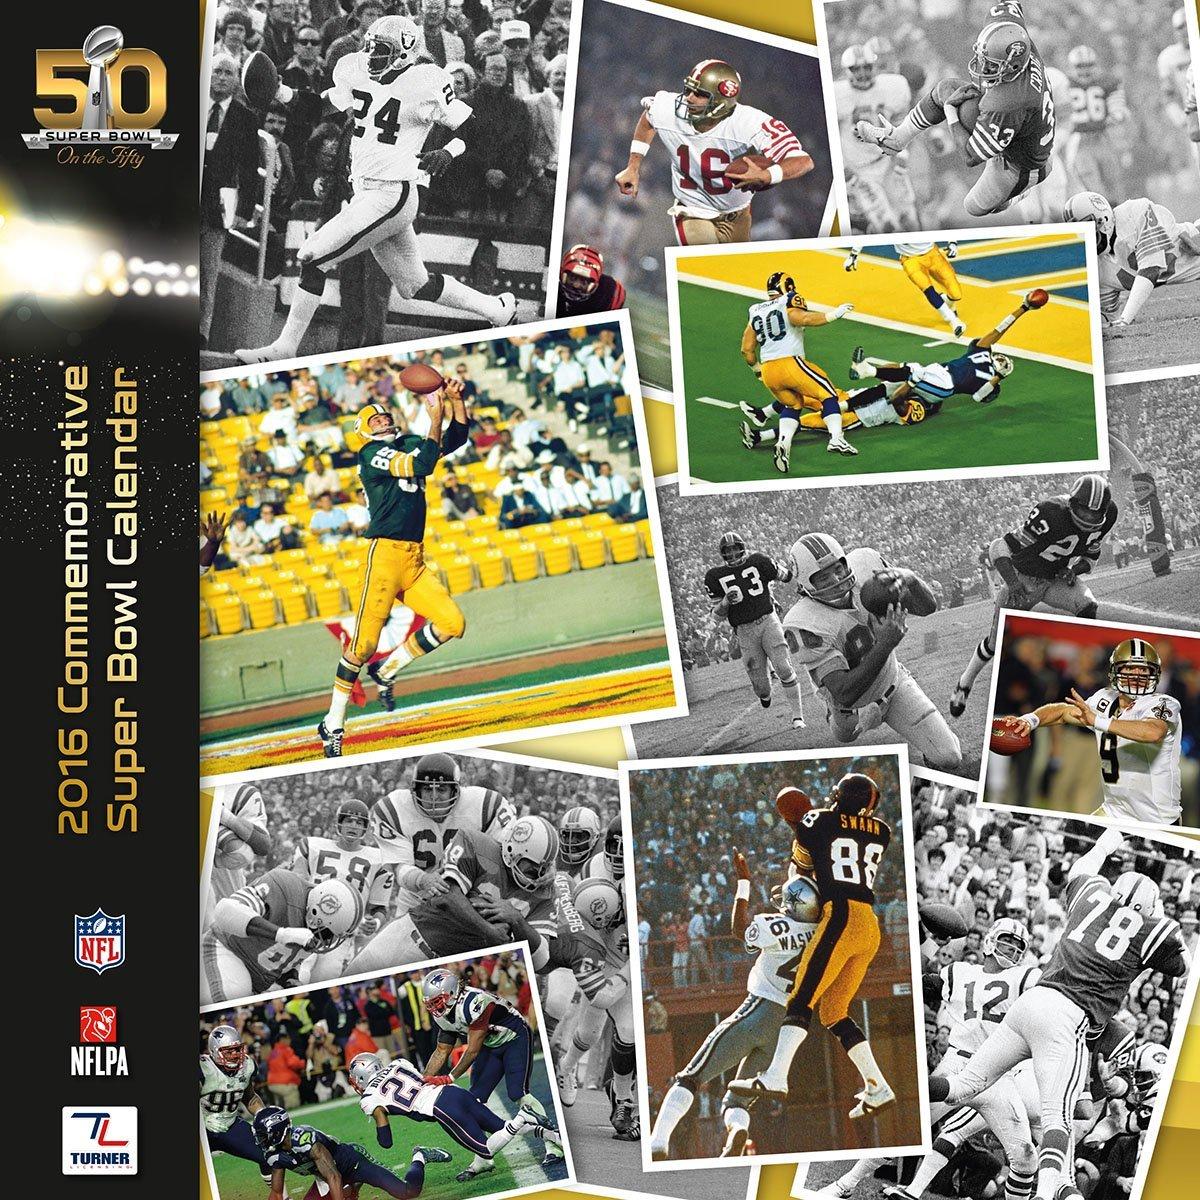 Turner 2016 Super Bowl 50 Commemorative Calendar, August 2015 - December 2016 (8011989)